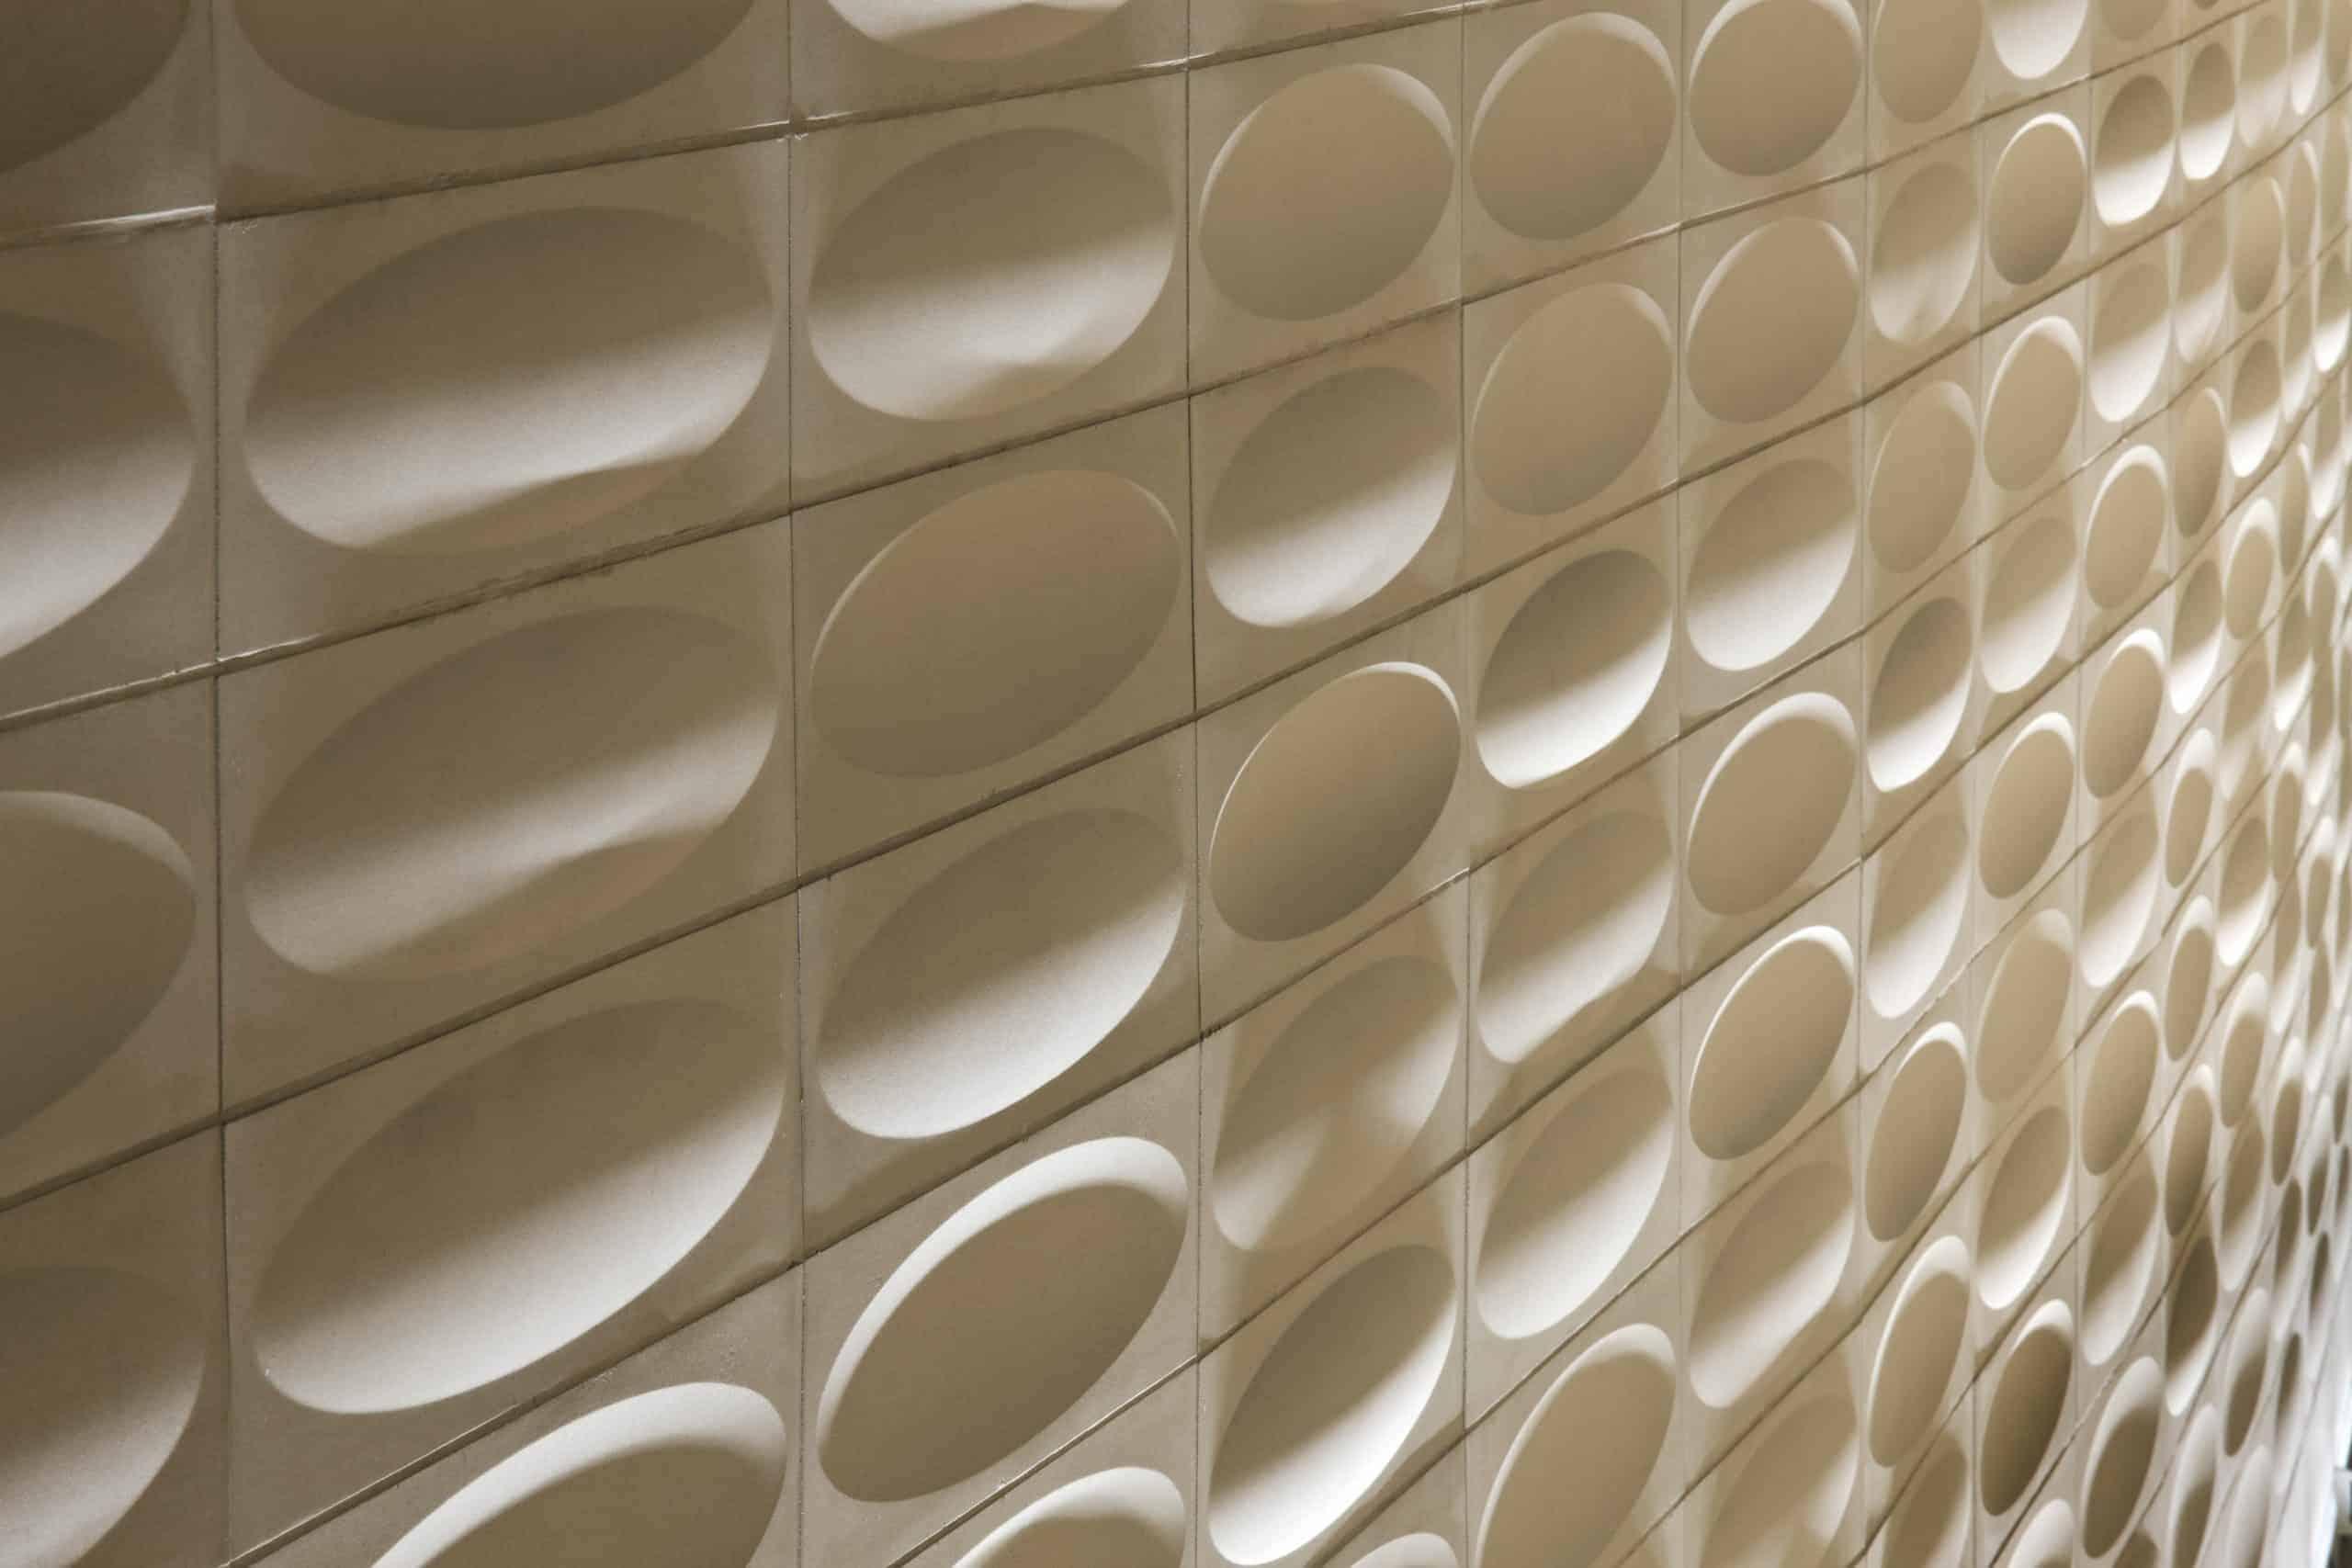 Architectural Lighting Design OVI EMPAC Chinese